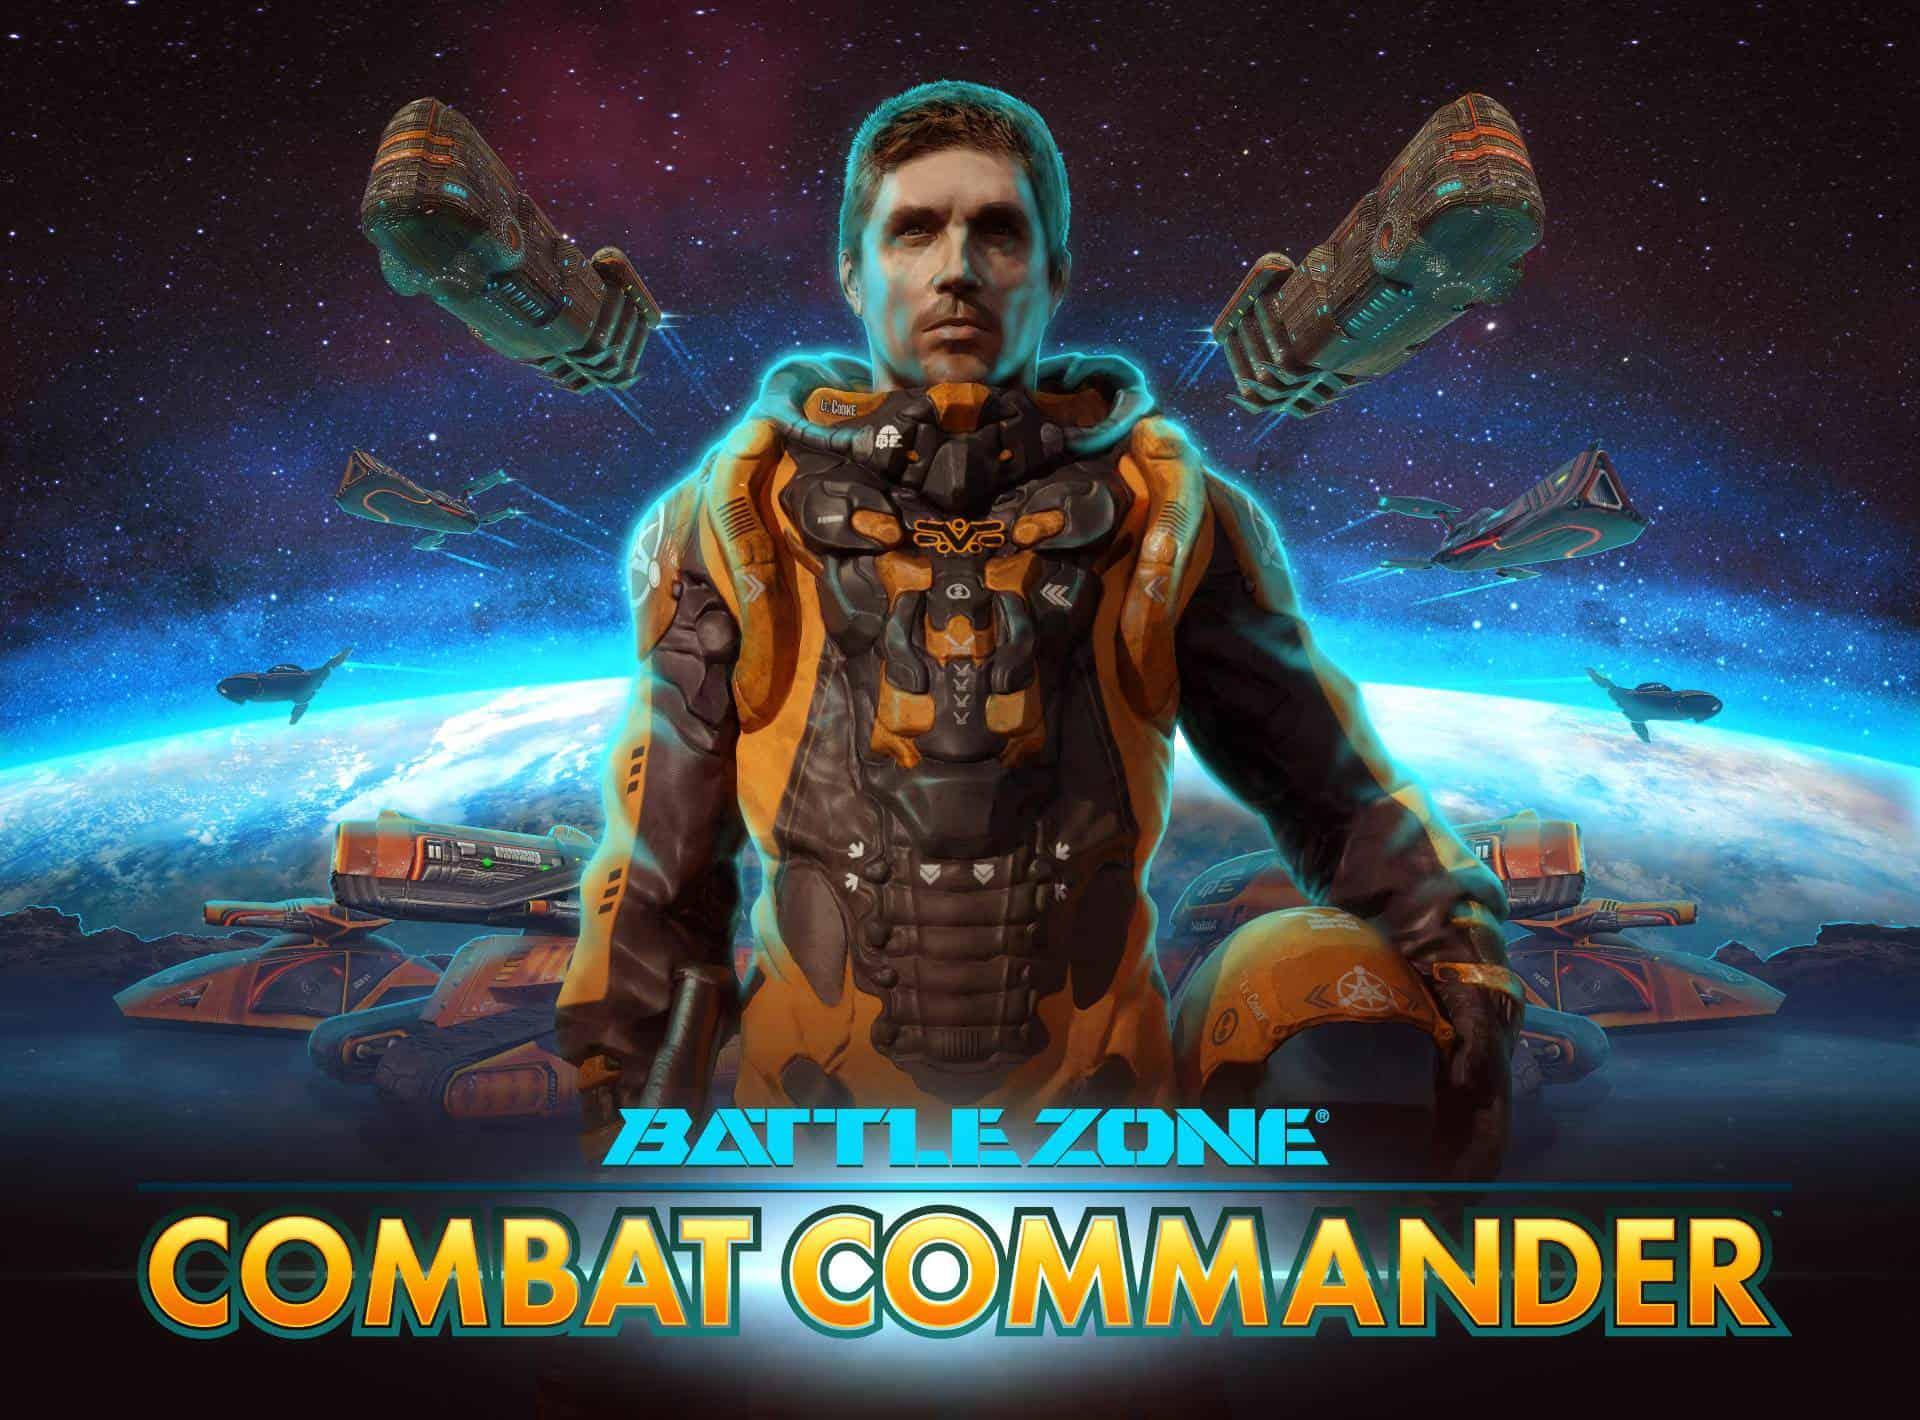 Battlezone Combat Commander herunterladen PC